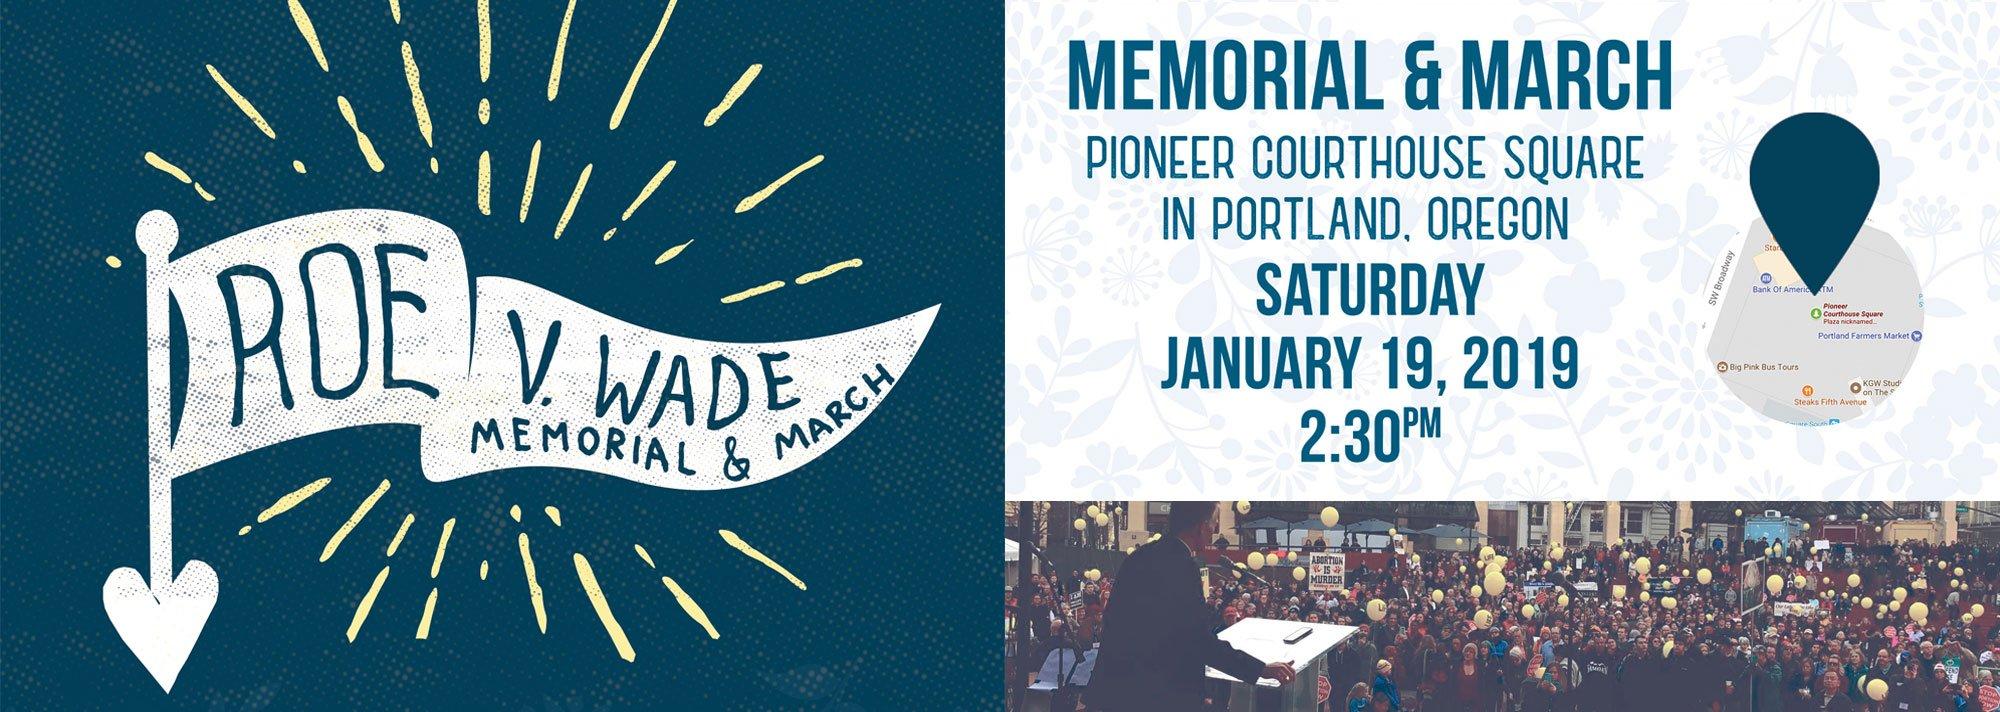 Roe v Wade memorial 2019